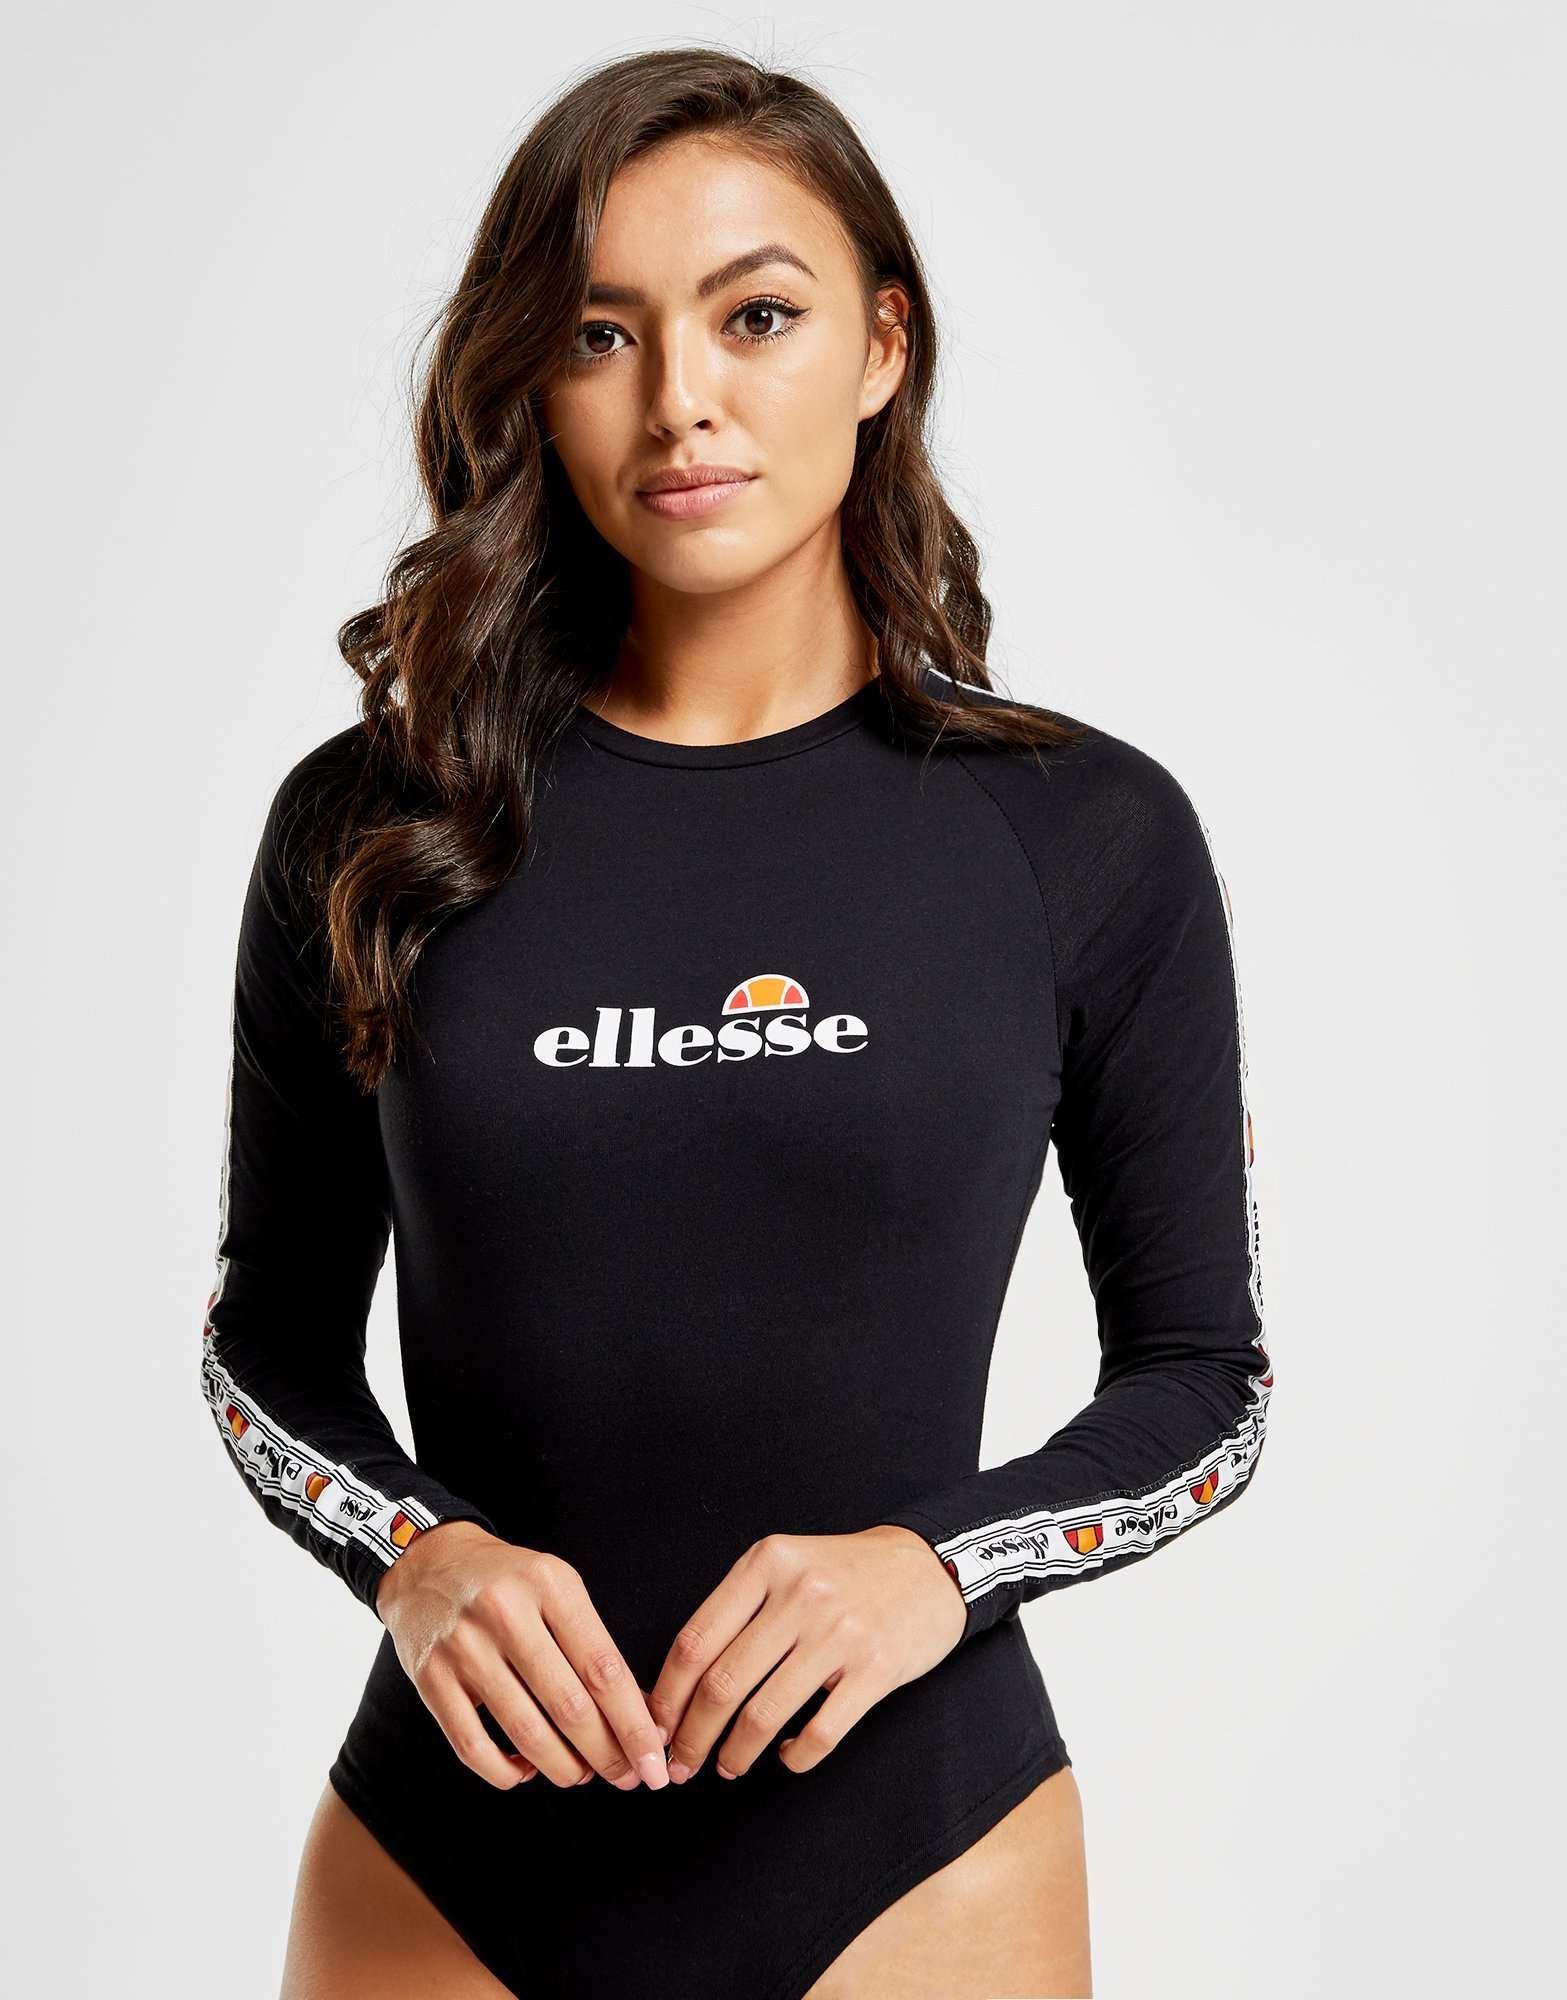 Ellesse Tape Long Sleeve Bodysuit Shop online for